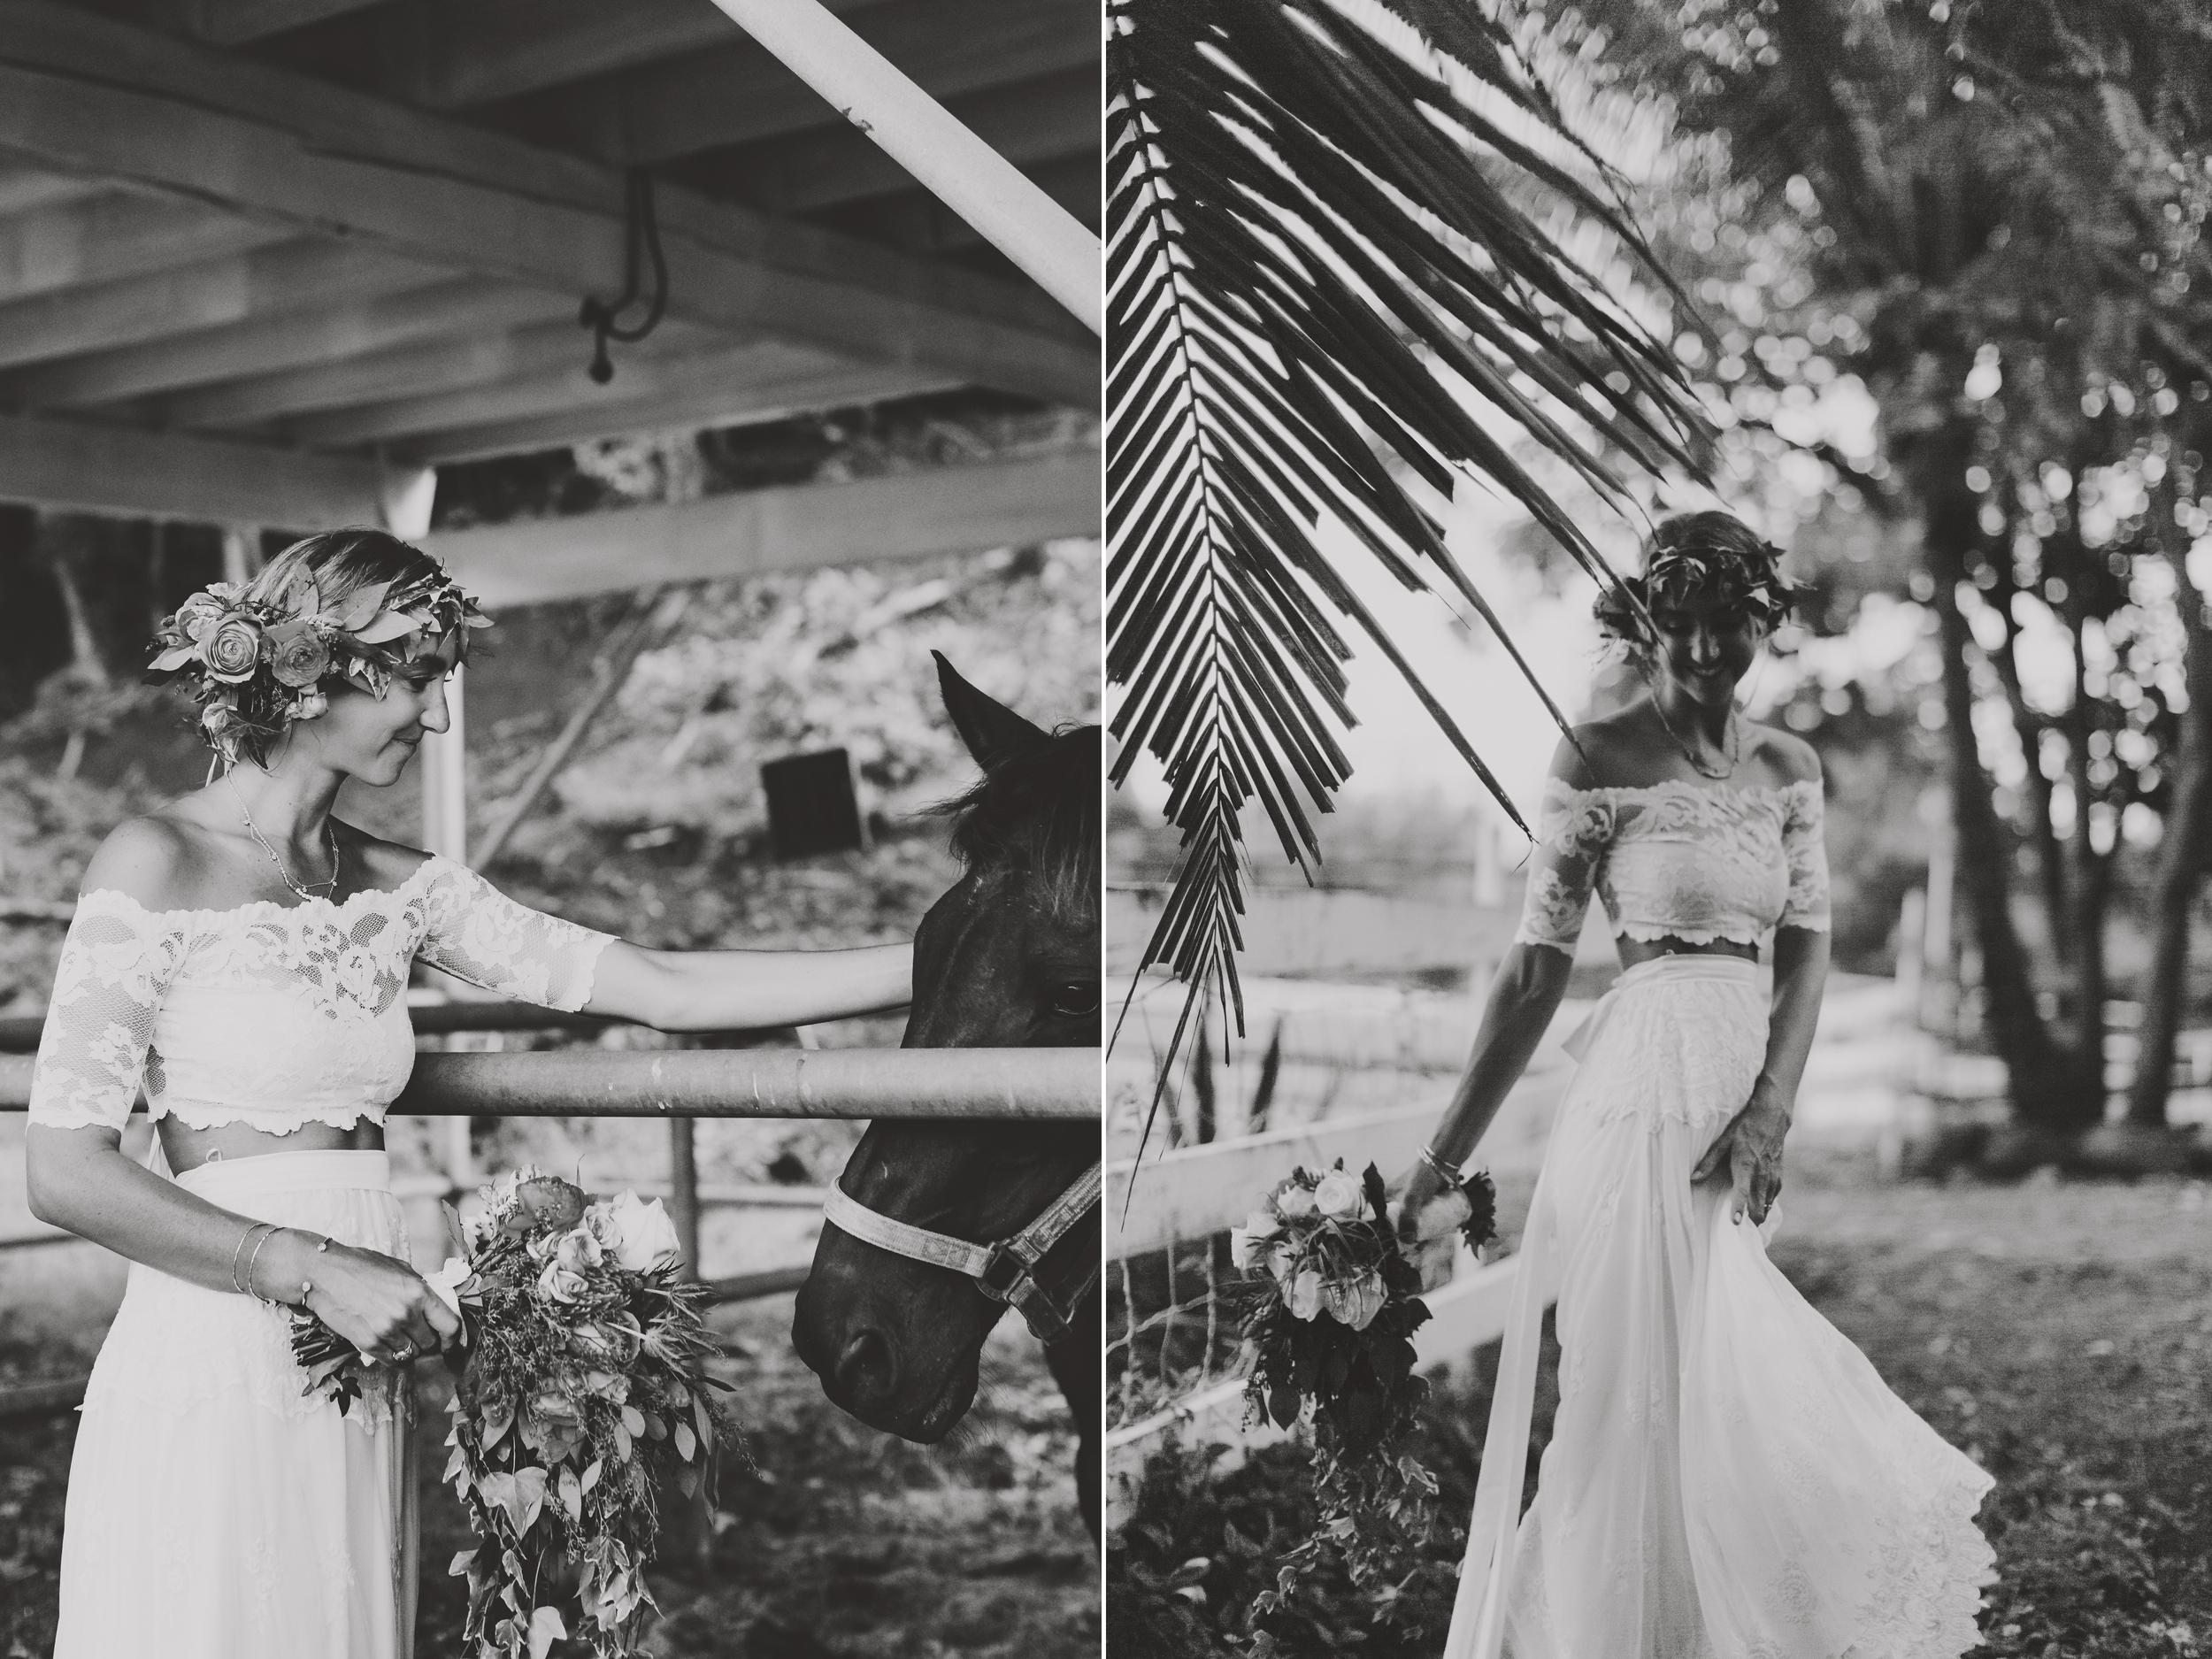 angie-diaz-photography-oahu-hawaii-wedding-tradewinds-ranch-78.jpg